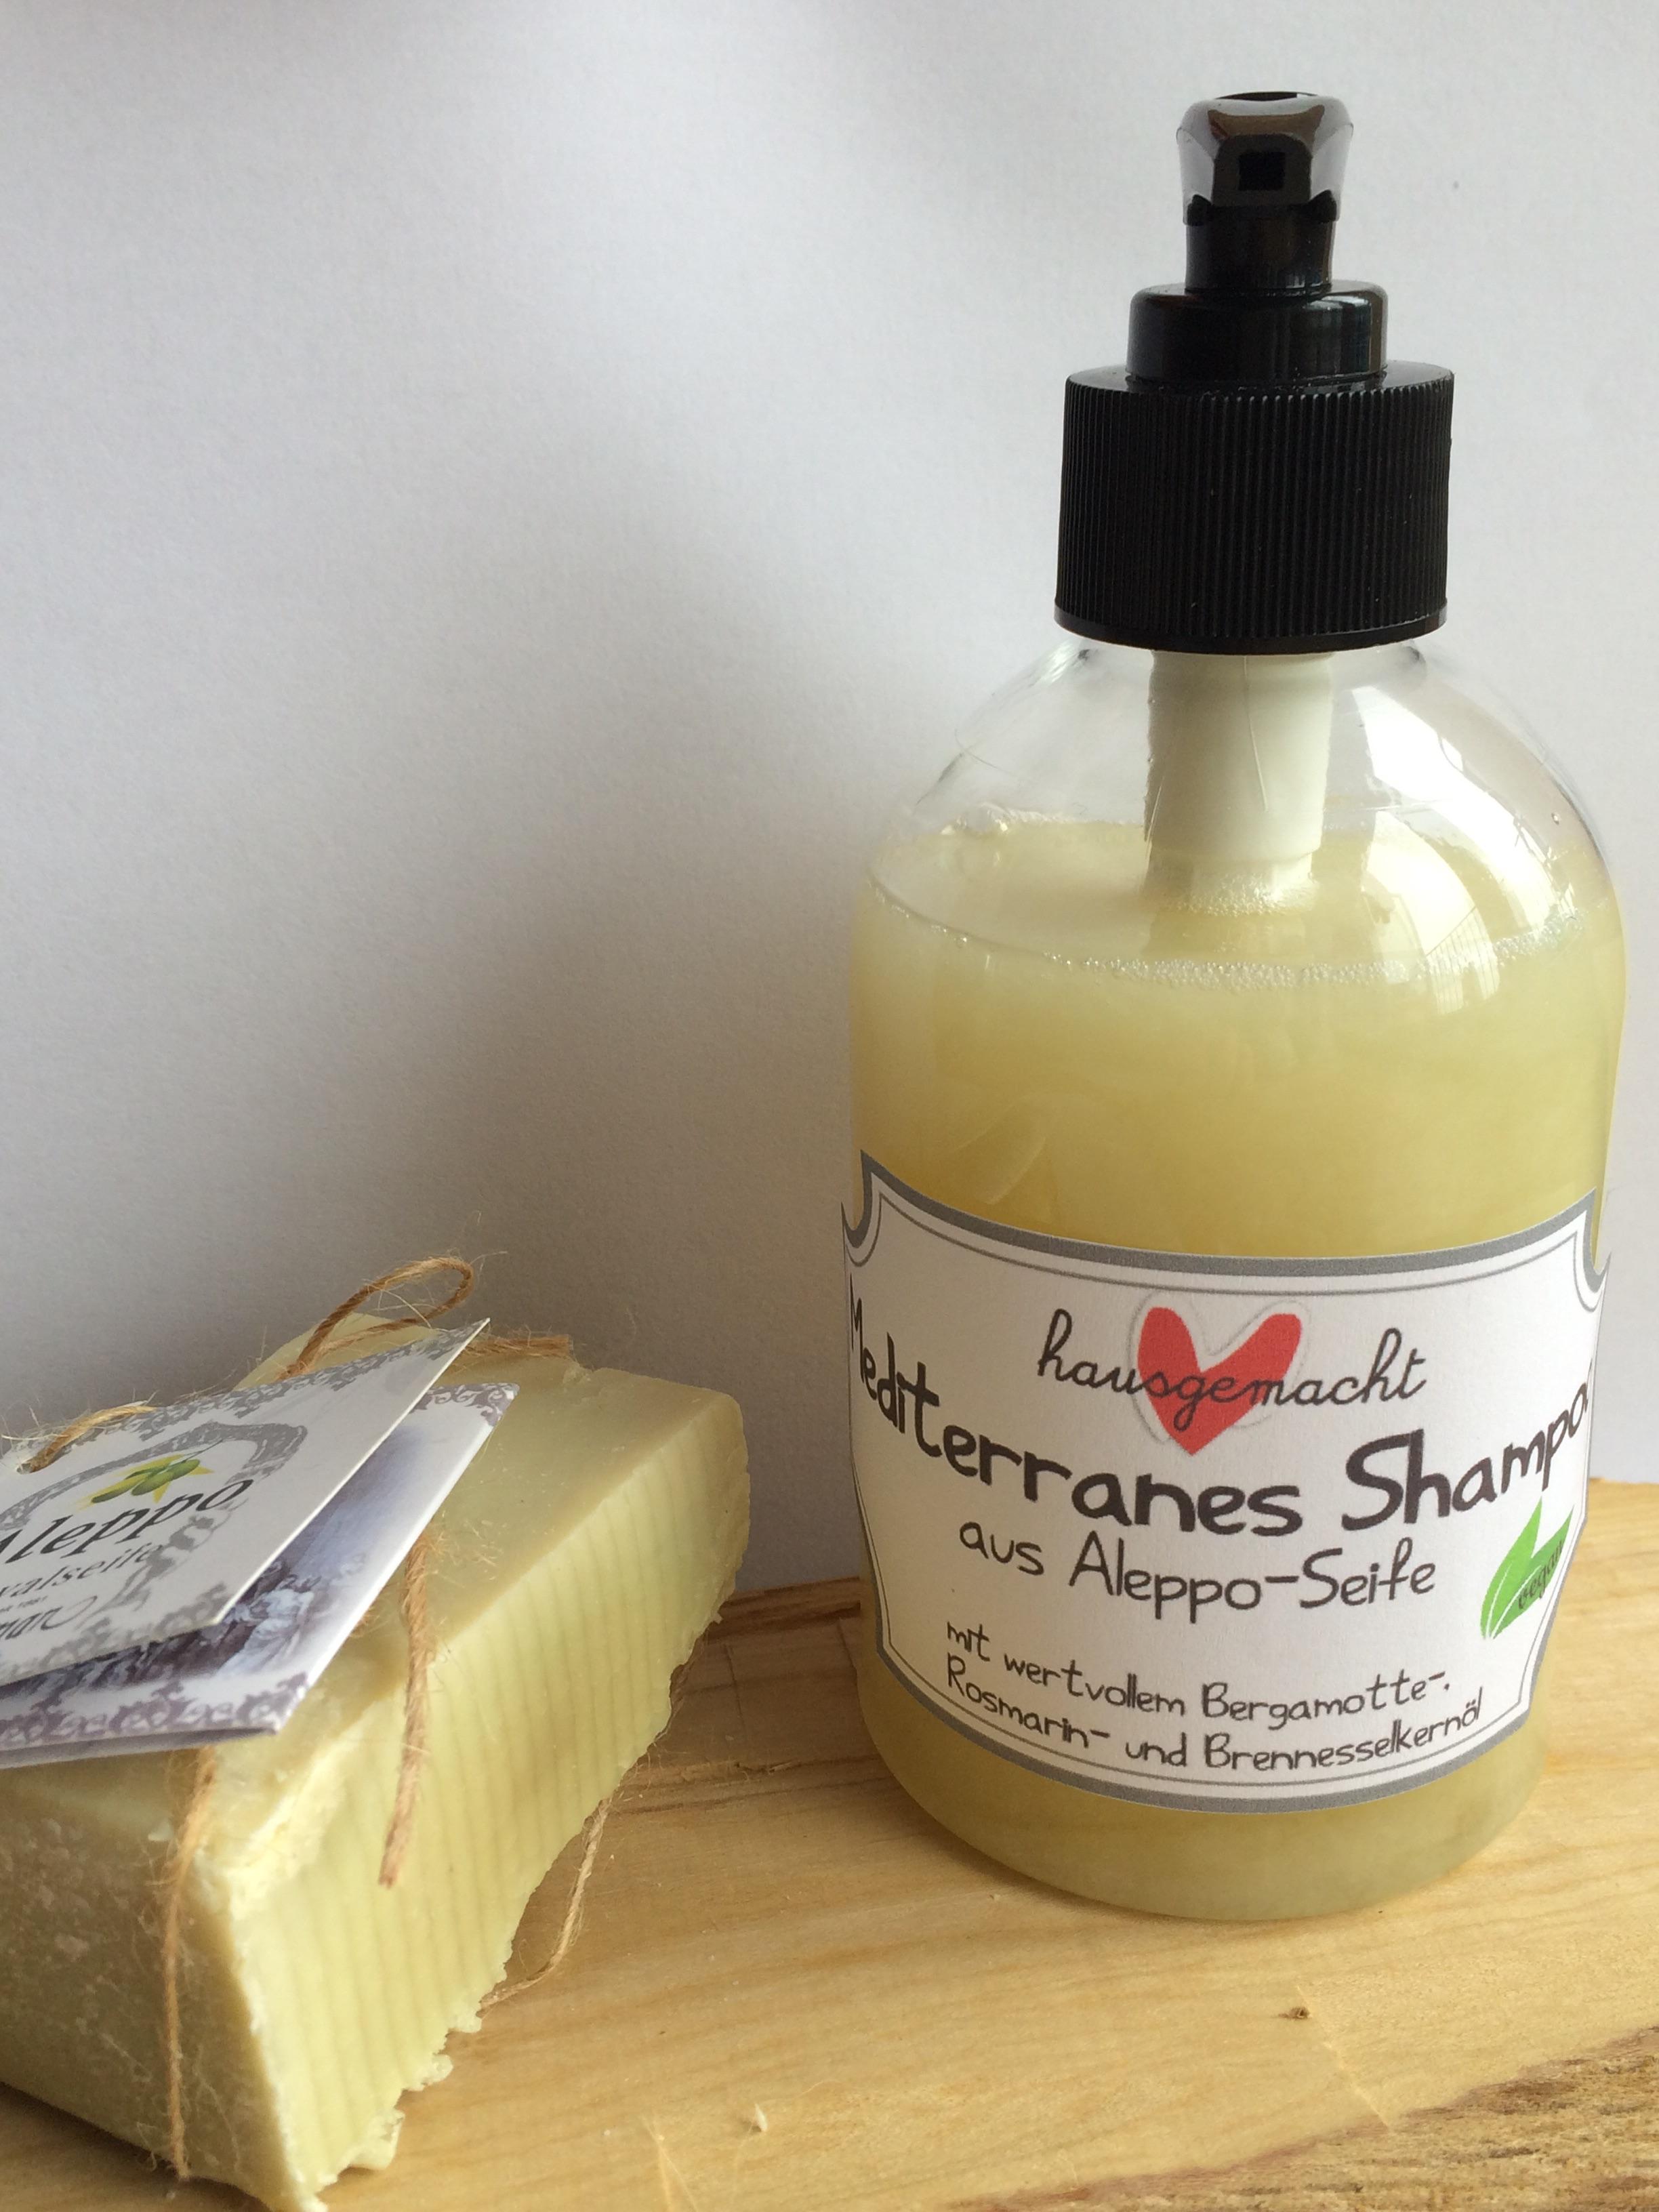 veganes shampoo aus aleppo seife miss made. Black Bedroom Furniture Sets. Home Design Ideas